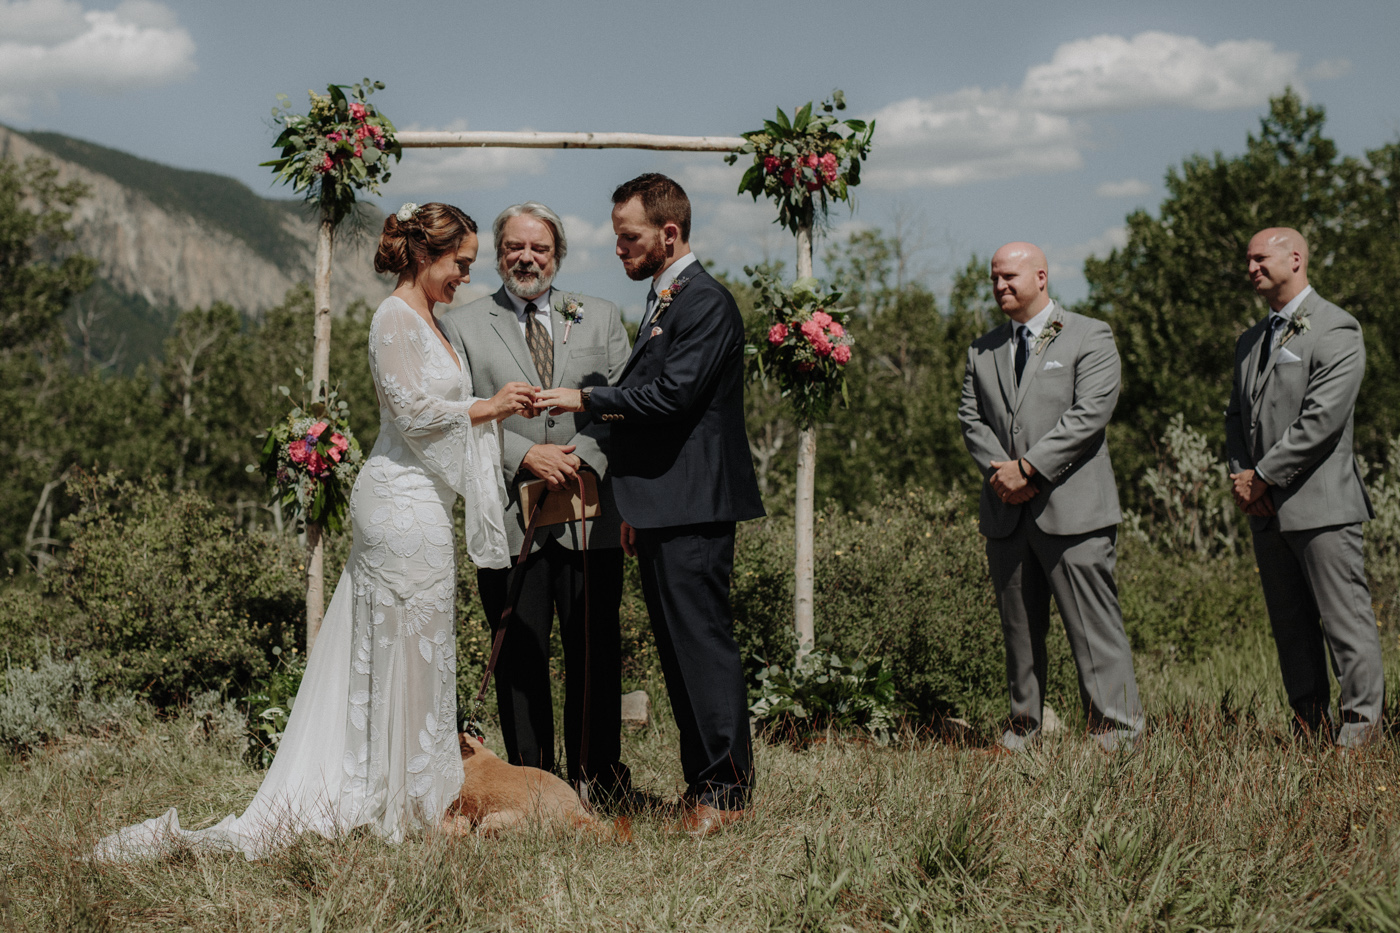 woods-walk-trail-crested-butte-colorado-wedding-50.jpg